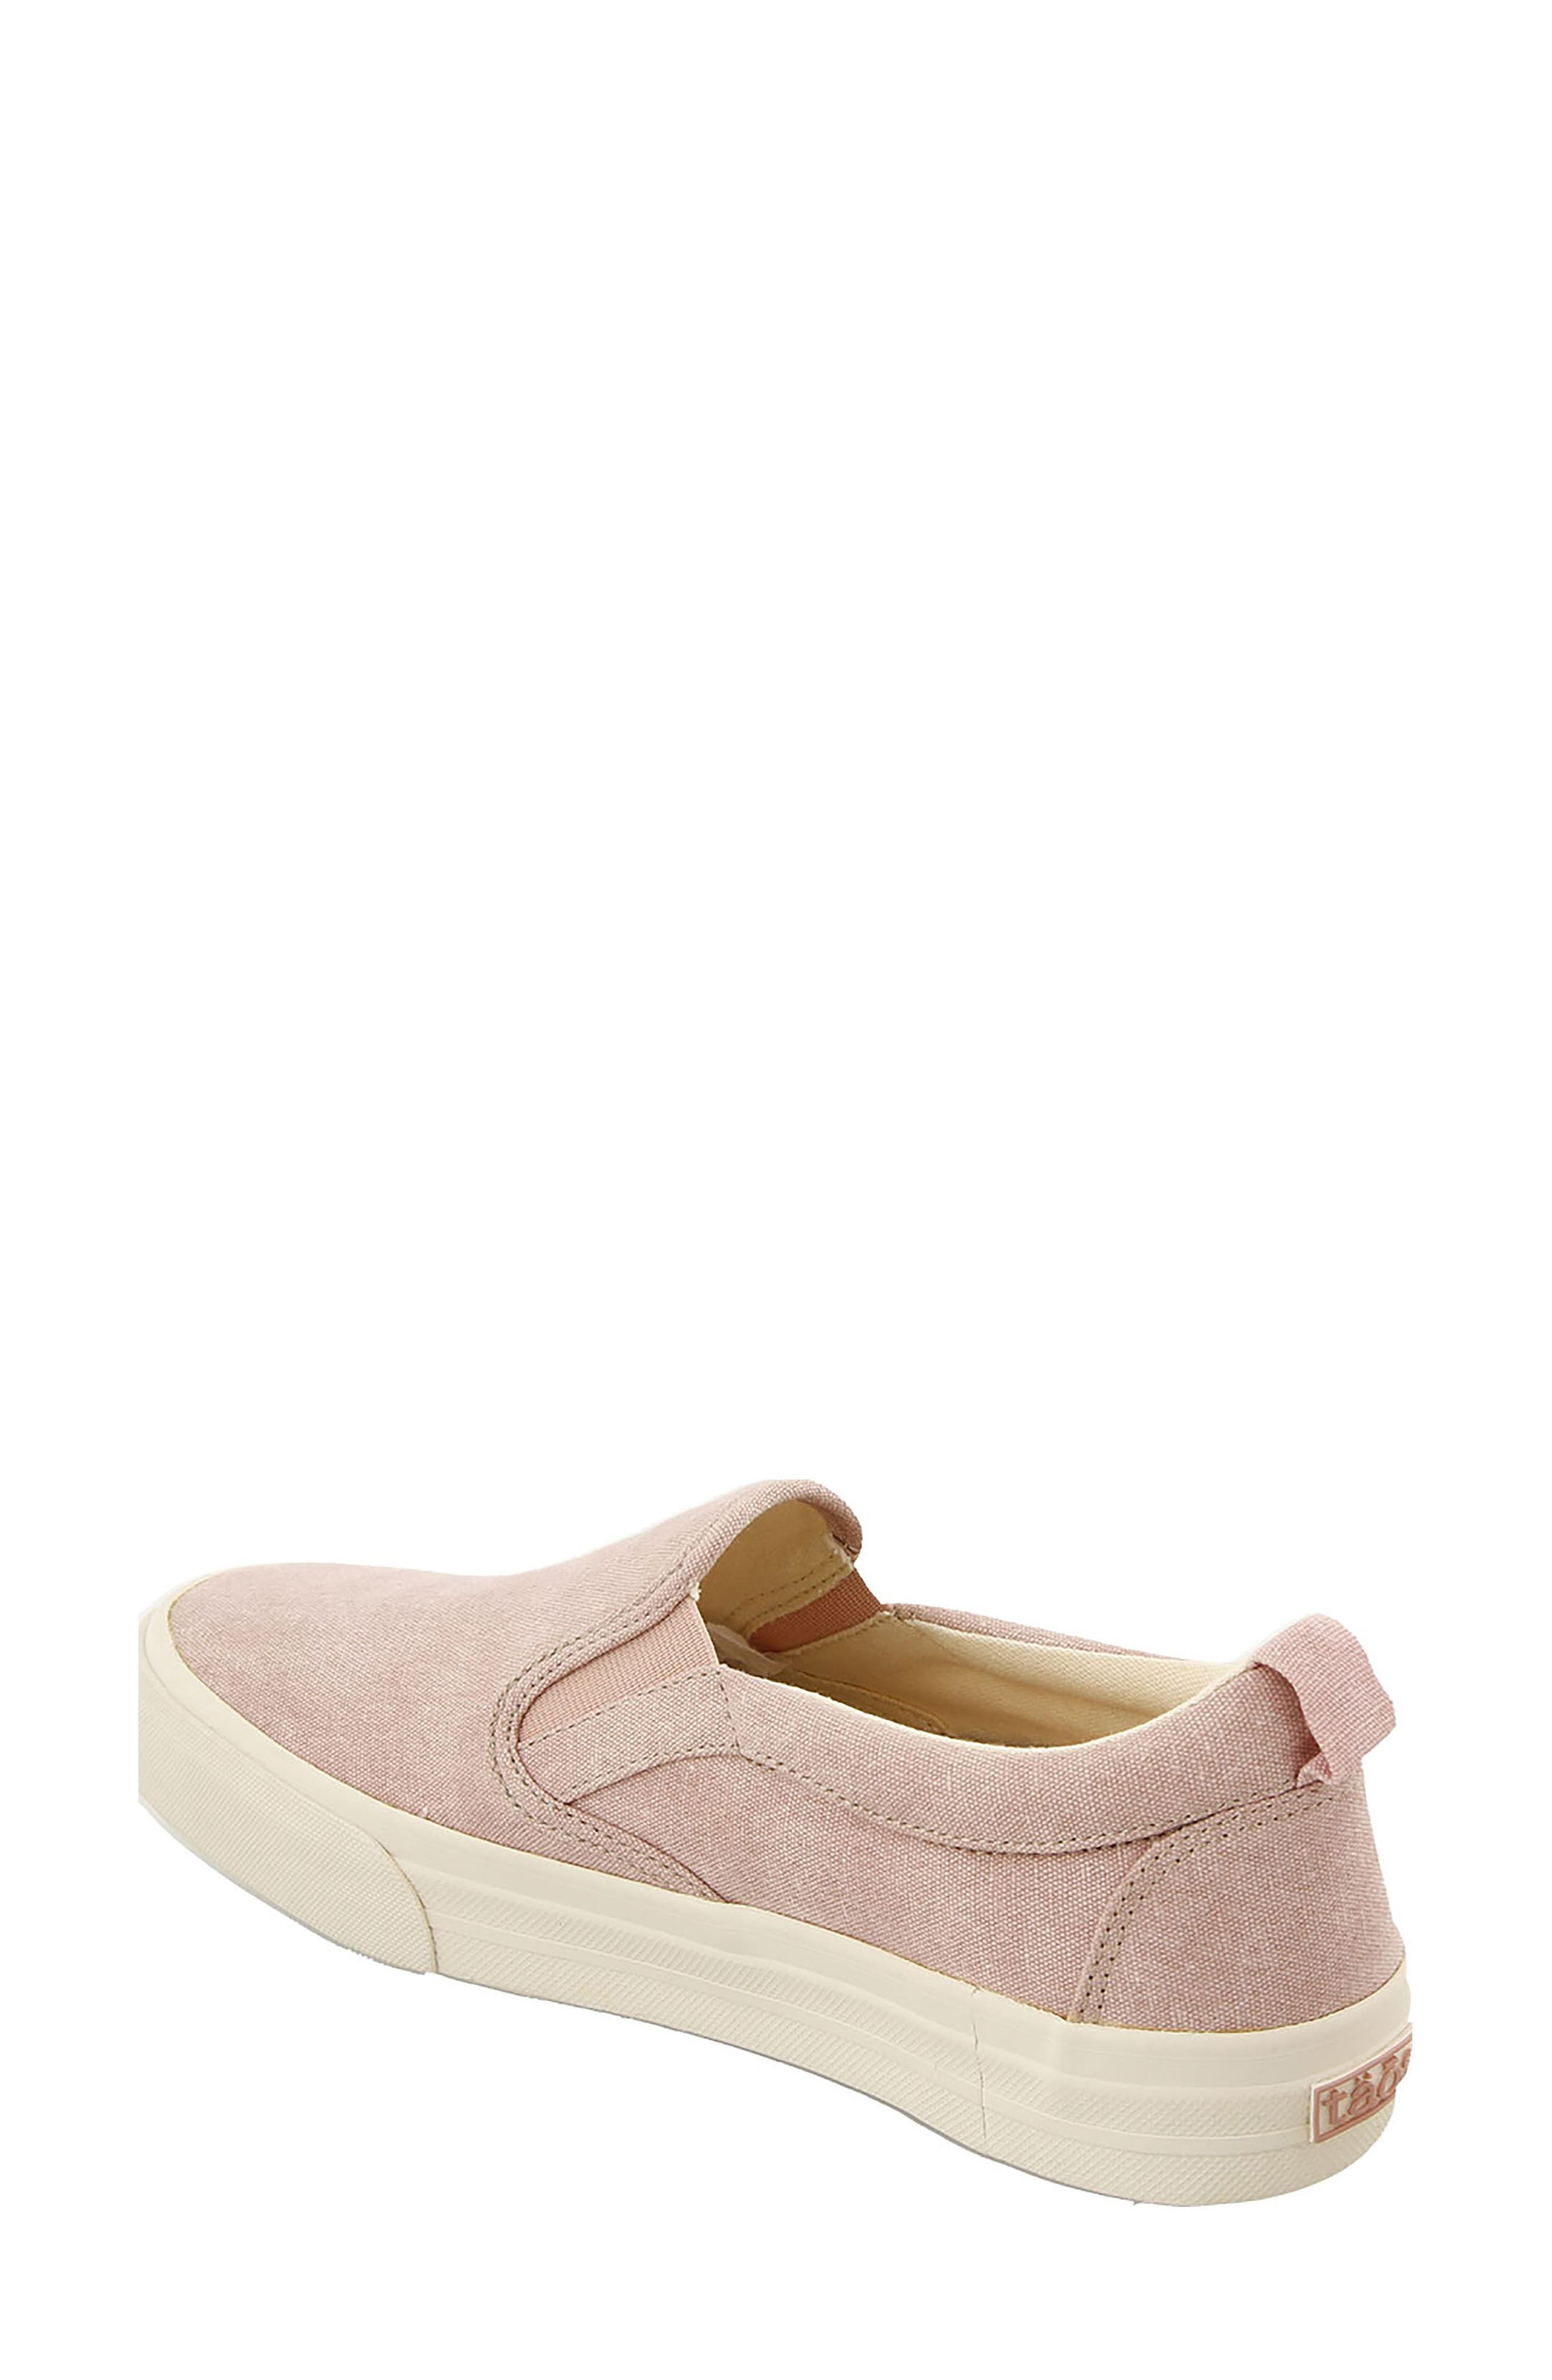 Soul Slip-On Sneaker,                             Alternate thumbnail 2, color,                             Pink Wash Canvas